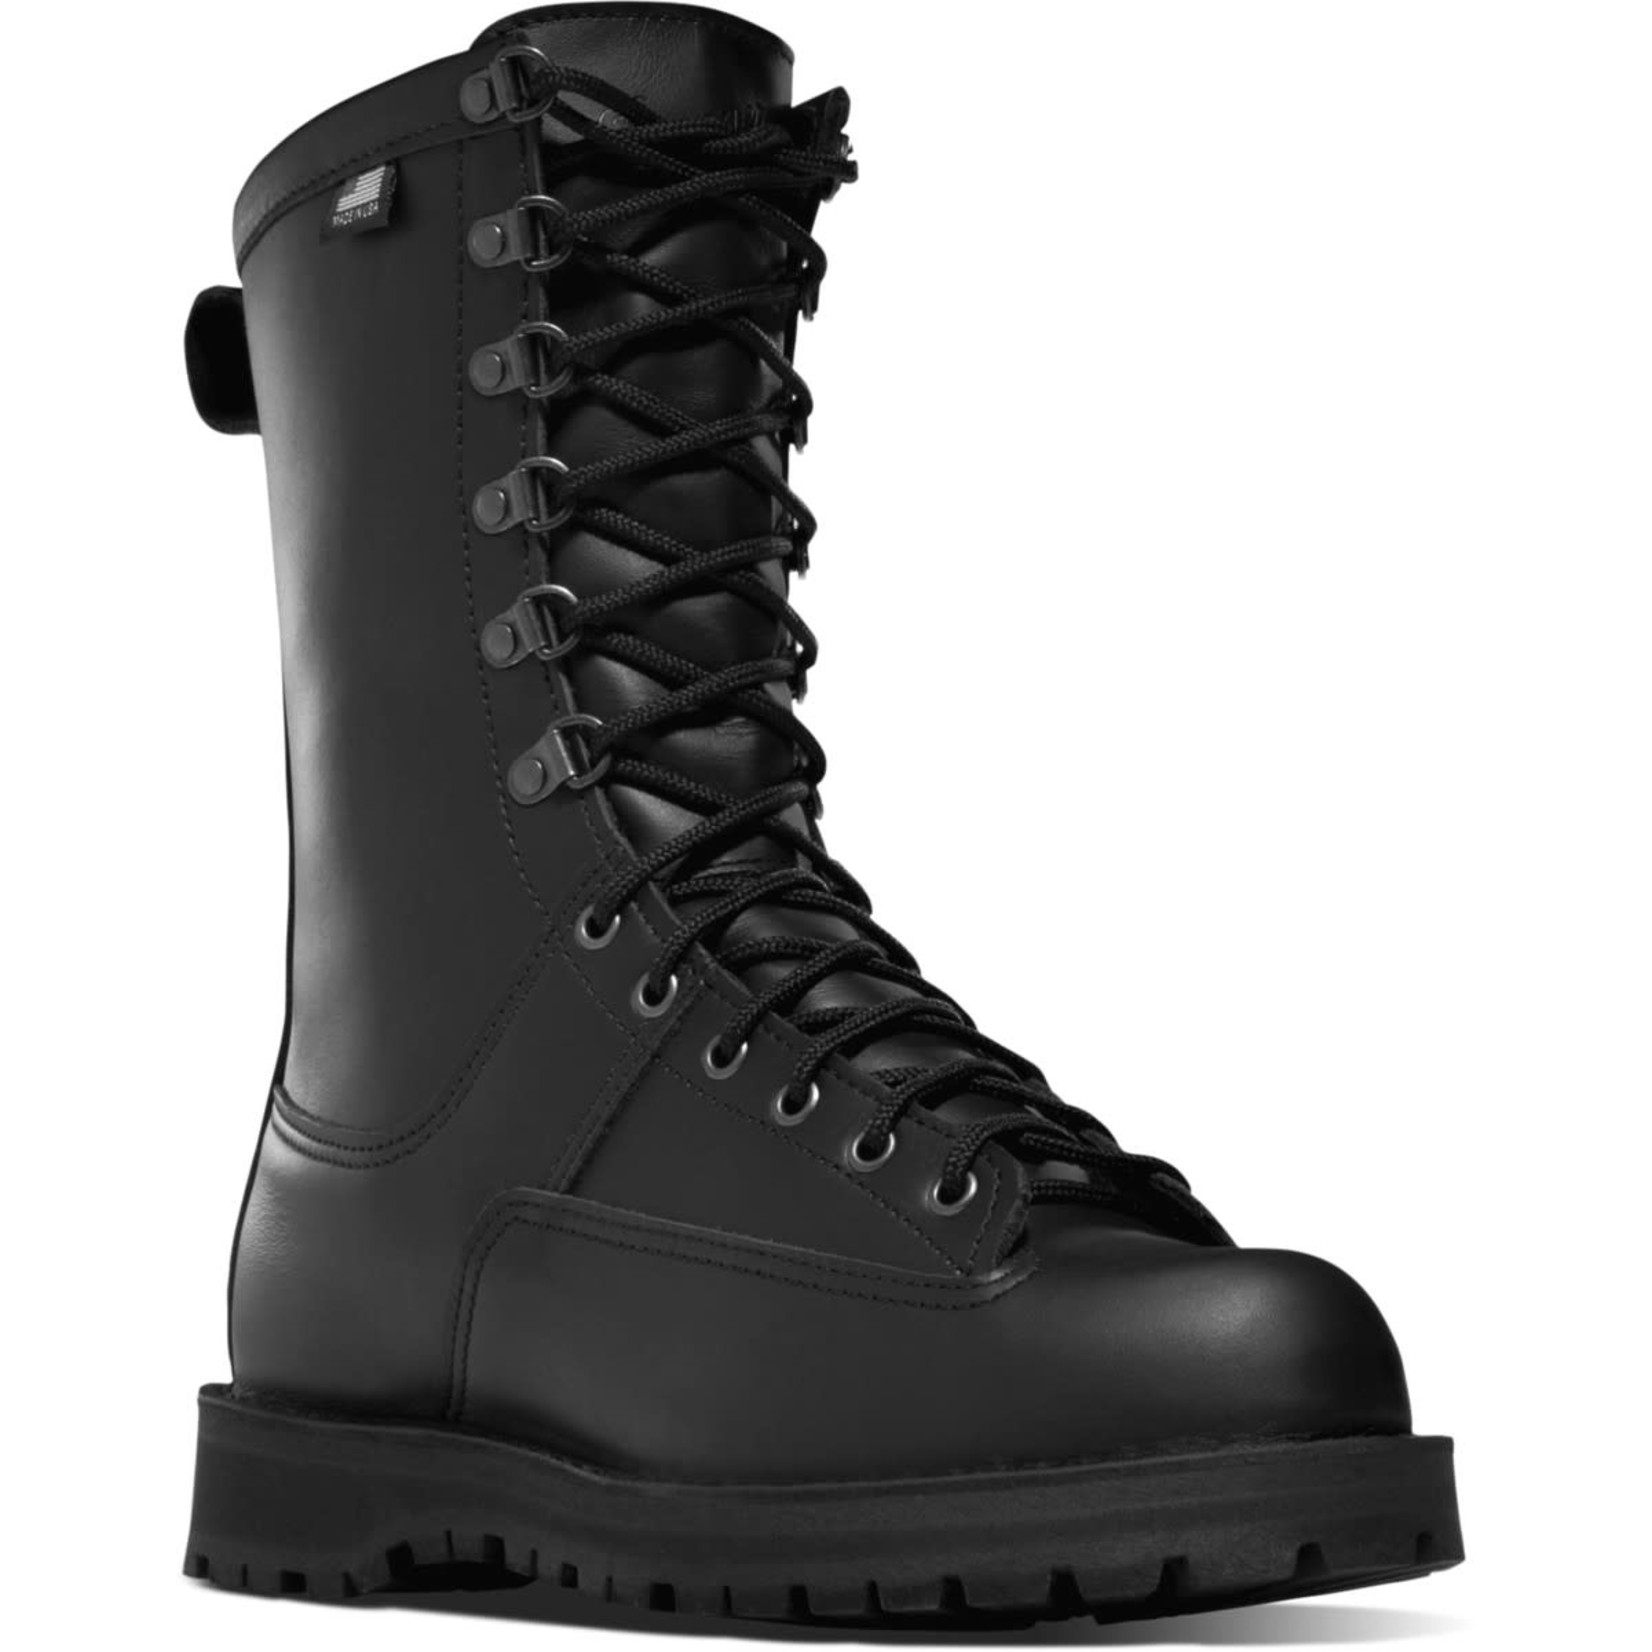 Danner Danner Fort Lewis 200G Boot Size 8 Wide